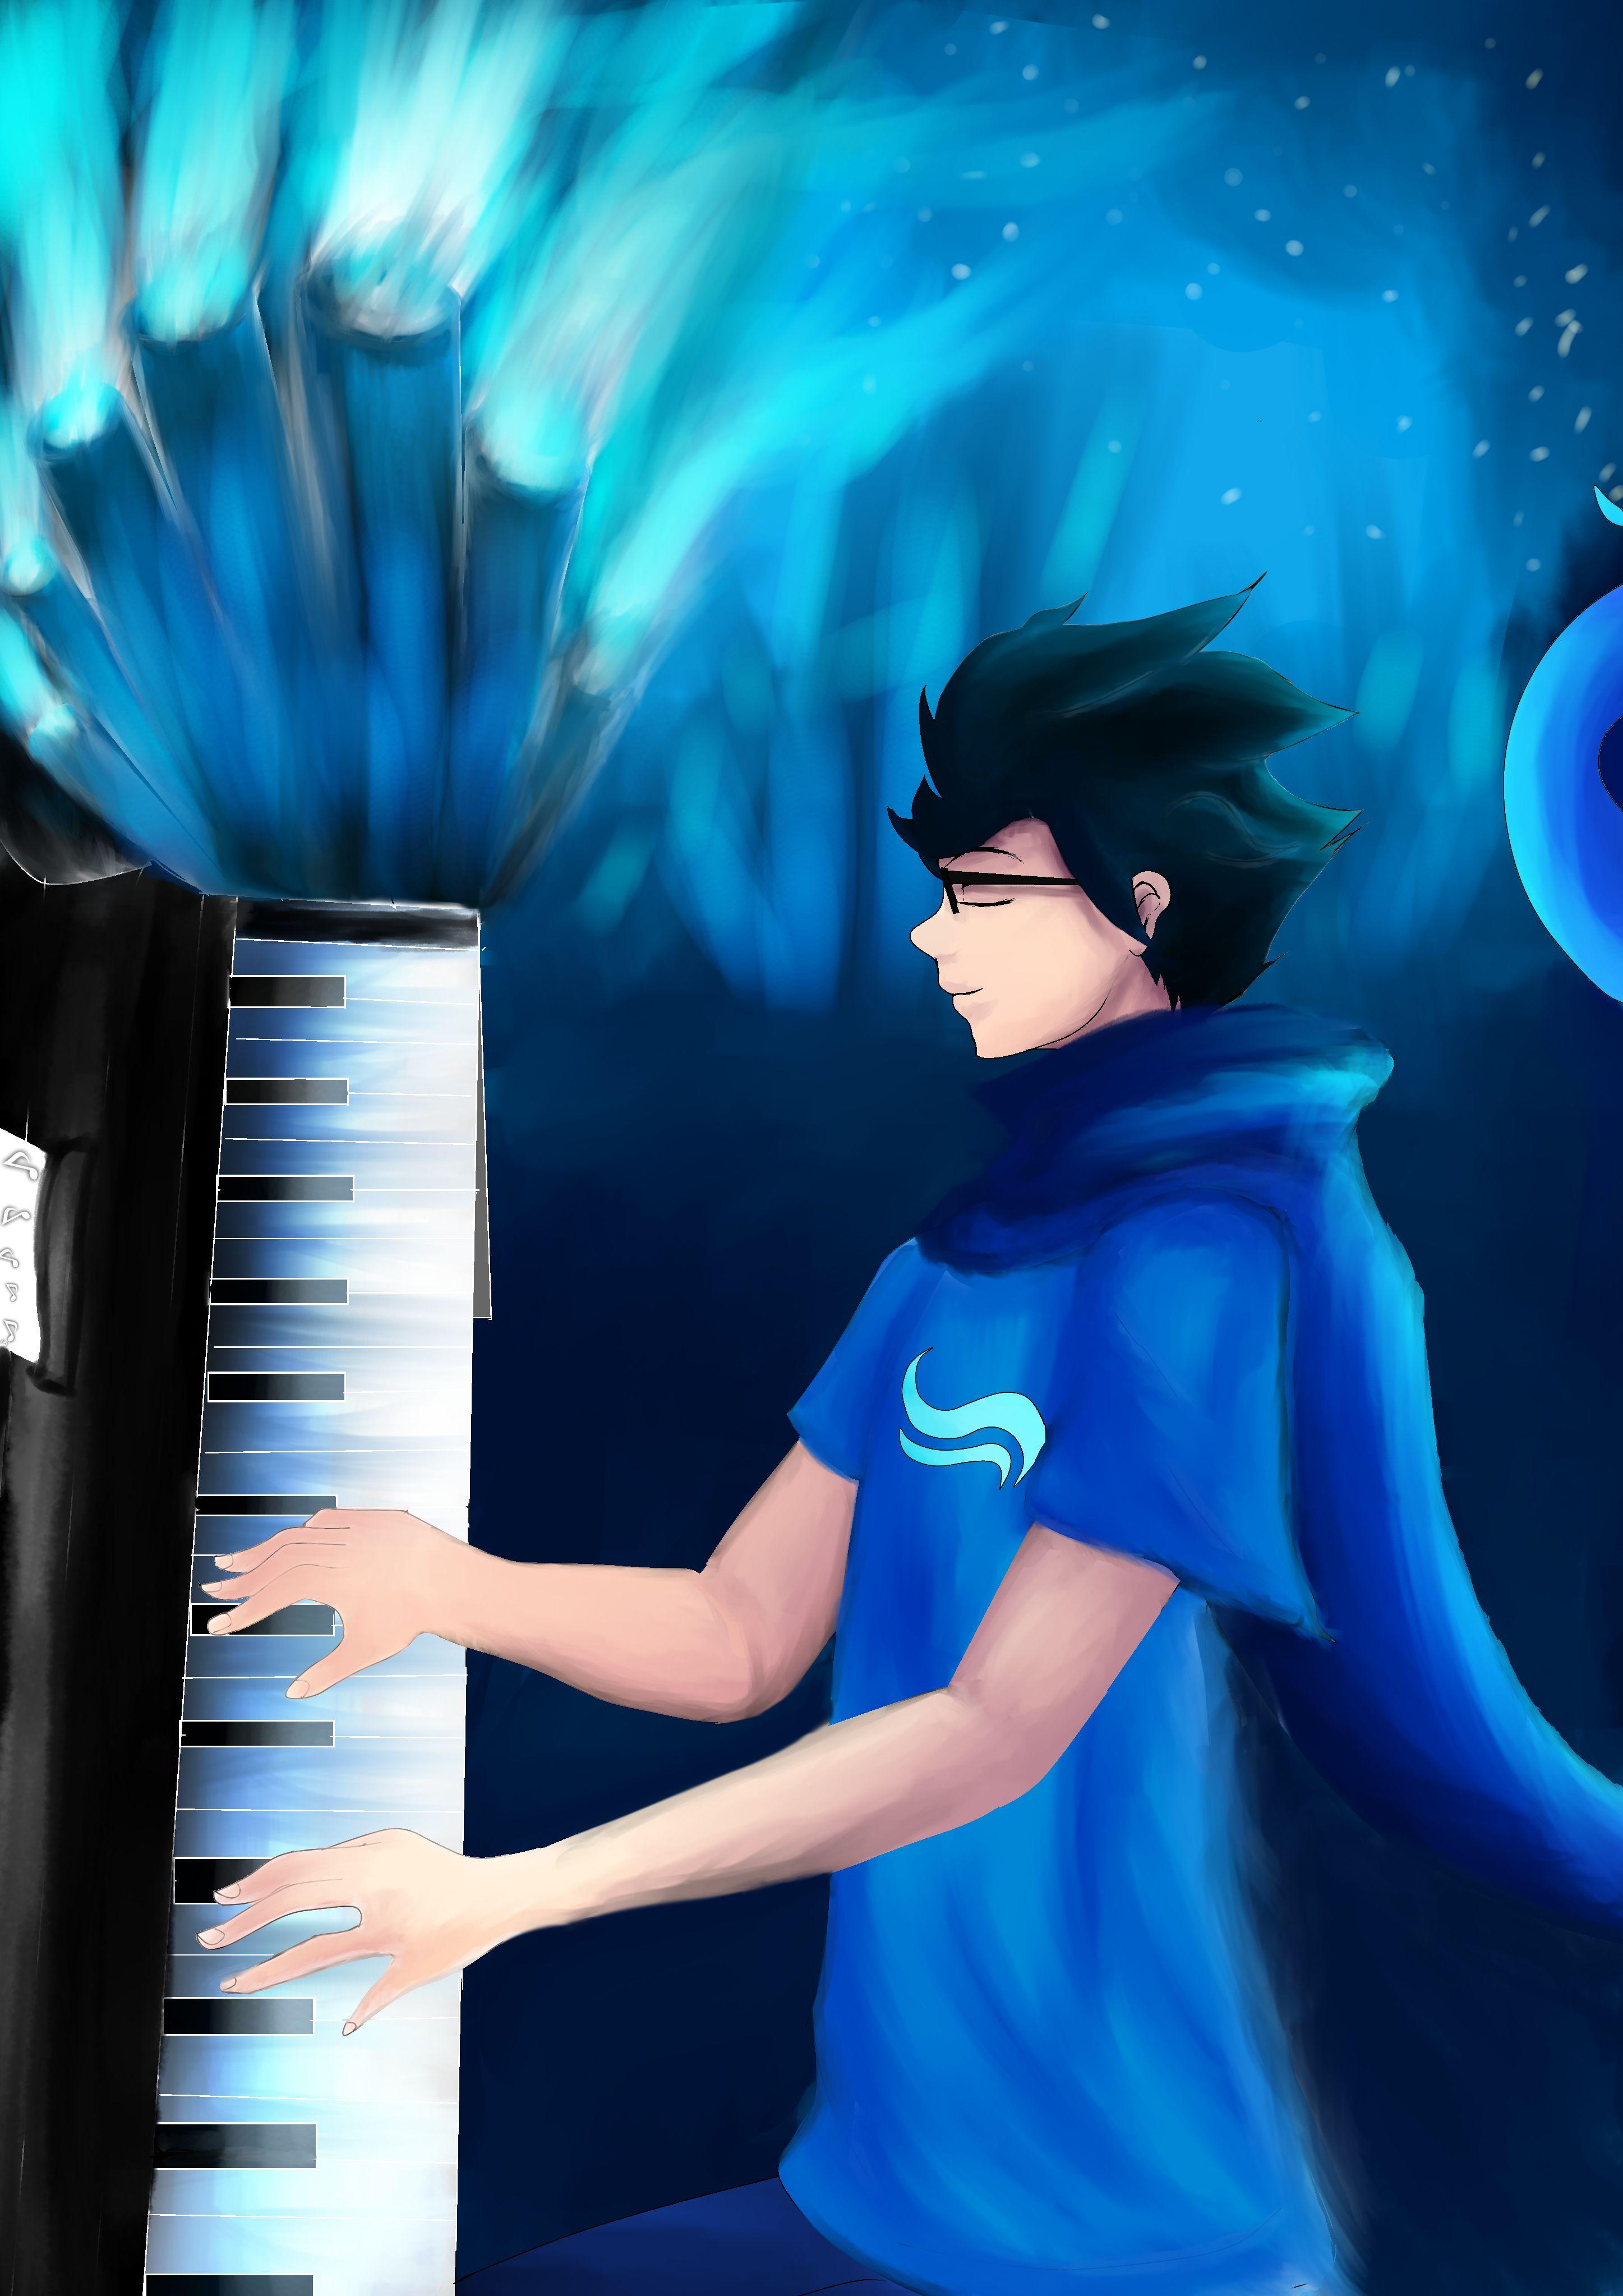 john egbert play the piano Homestuck, Homestuck john, Piano